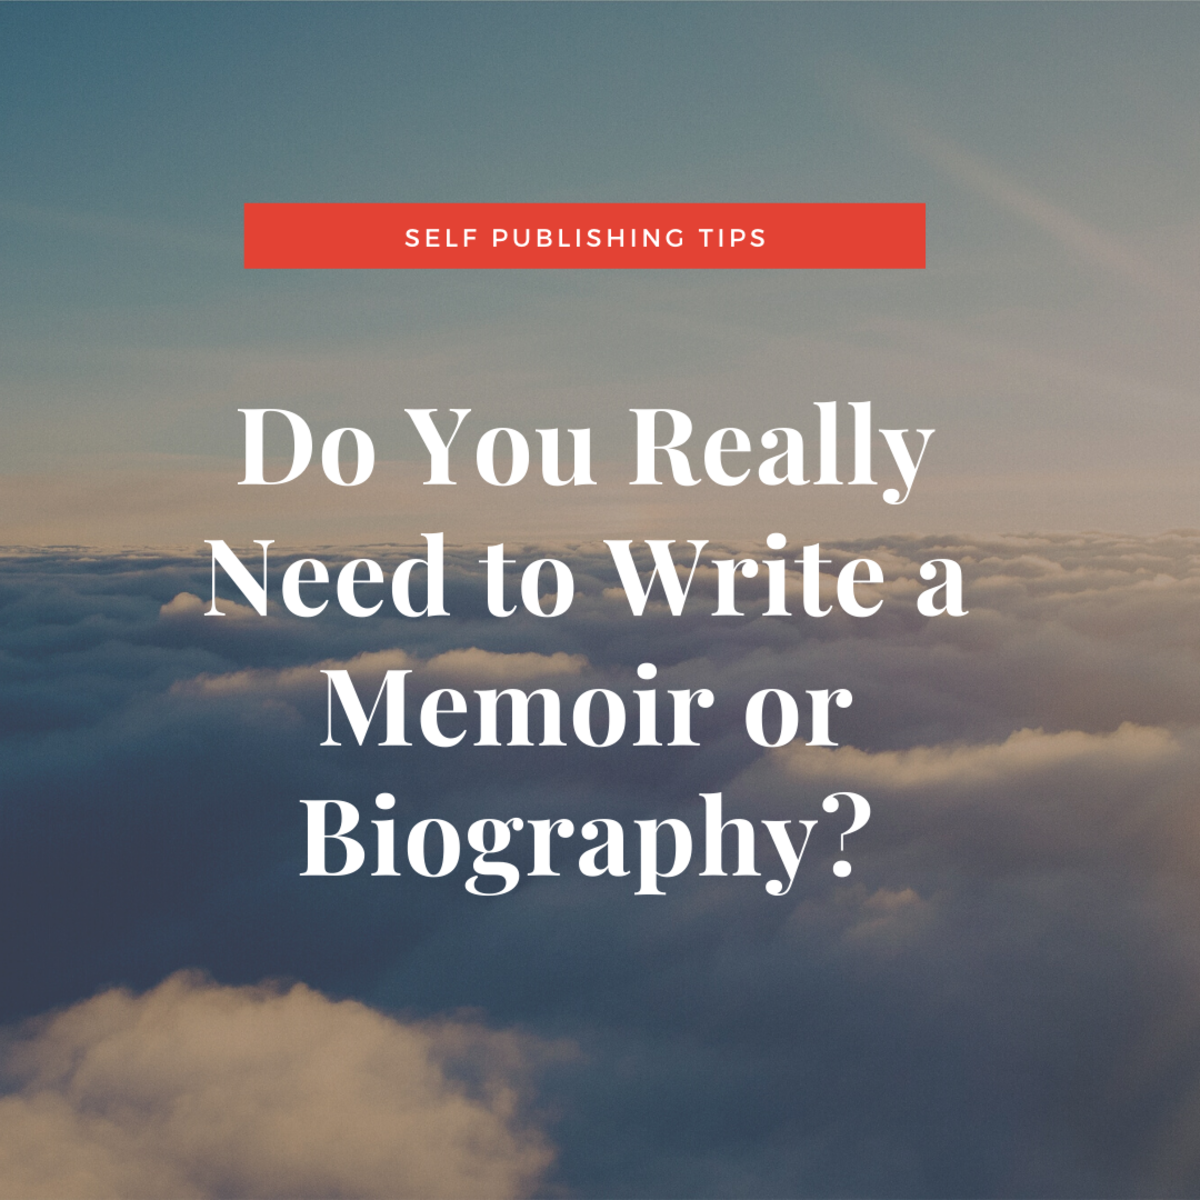 Do You Really Need to Write a Memoir or Biography?